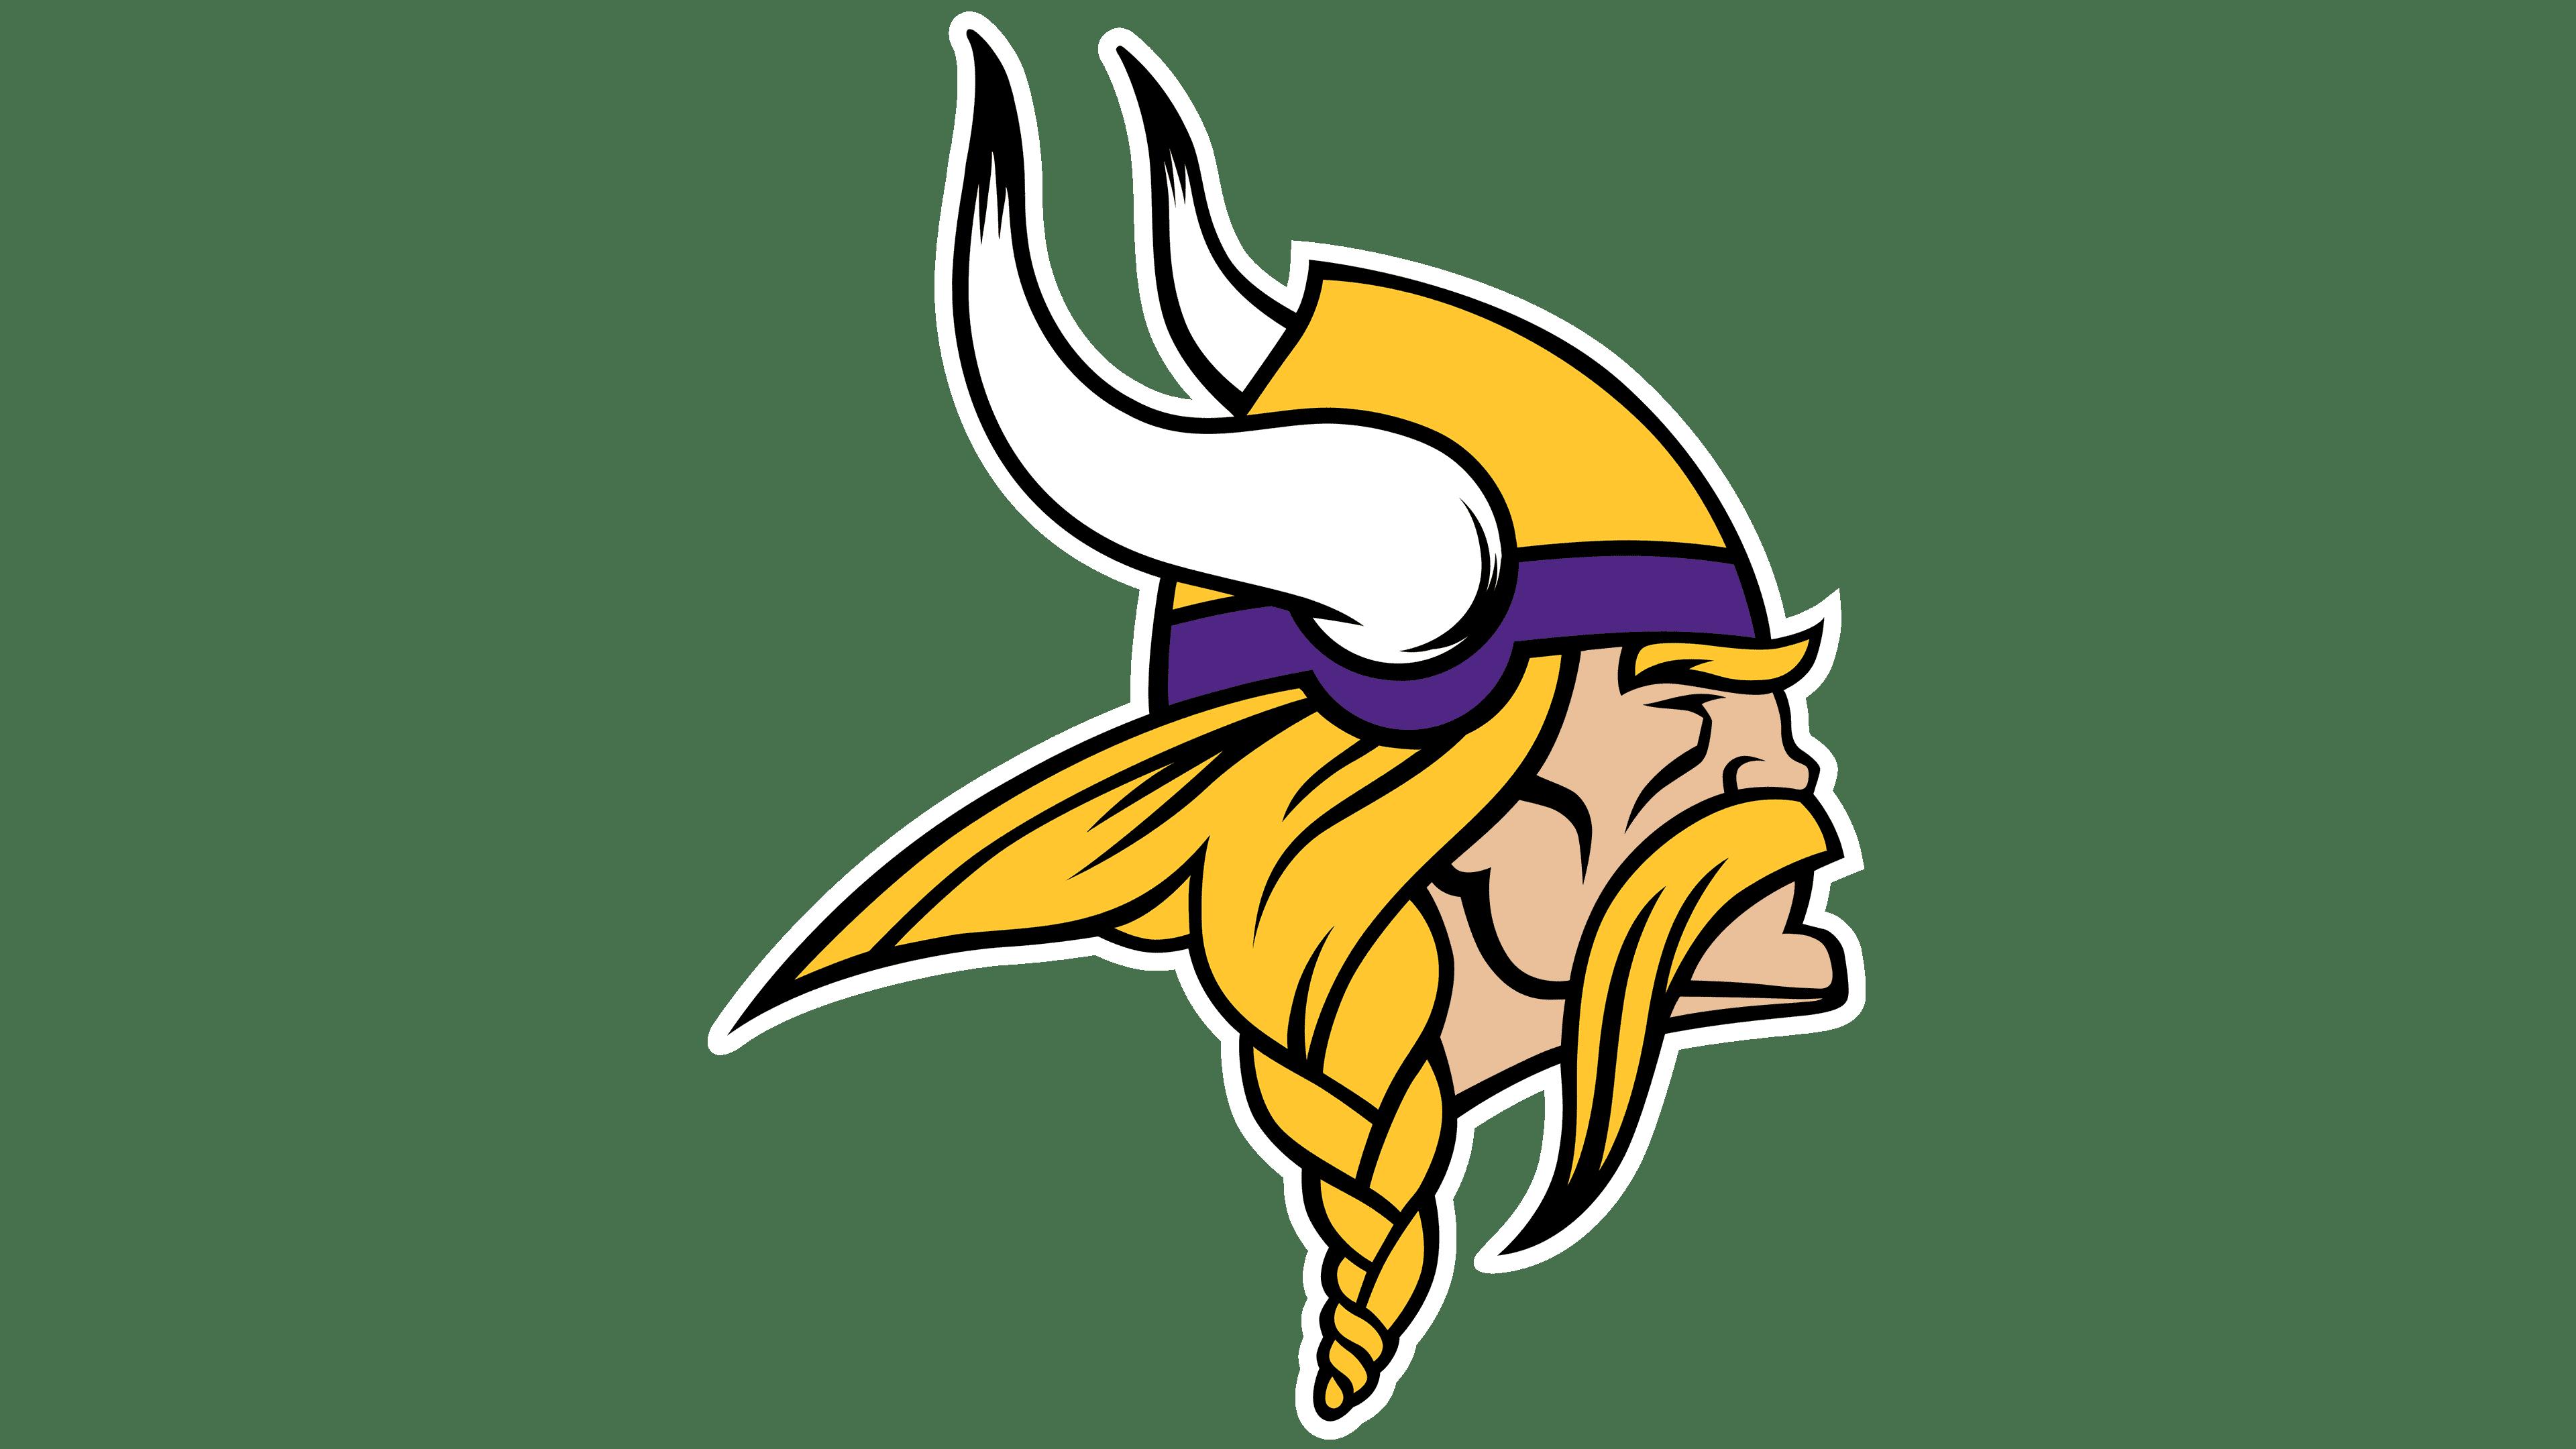 Minnesota Vikings Logo | Symbol, History, PNG (3840*2160)